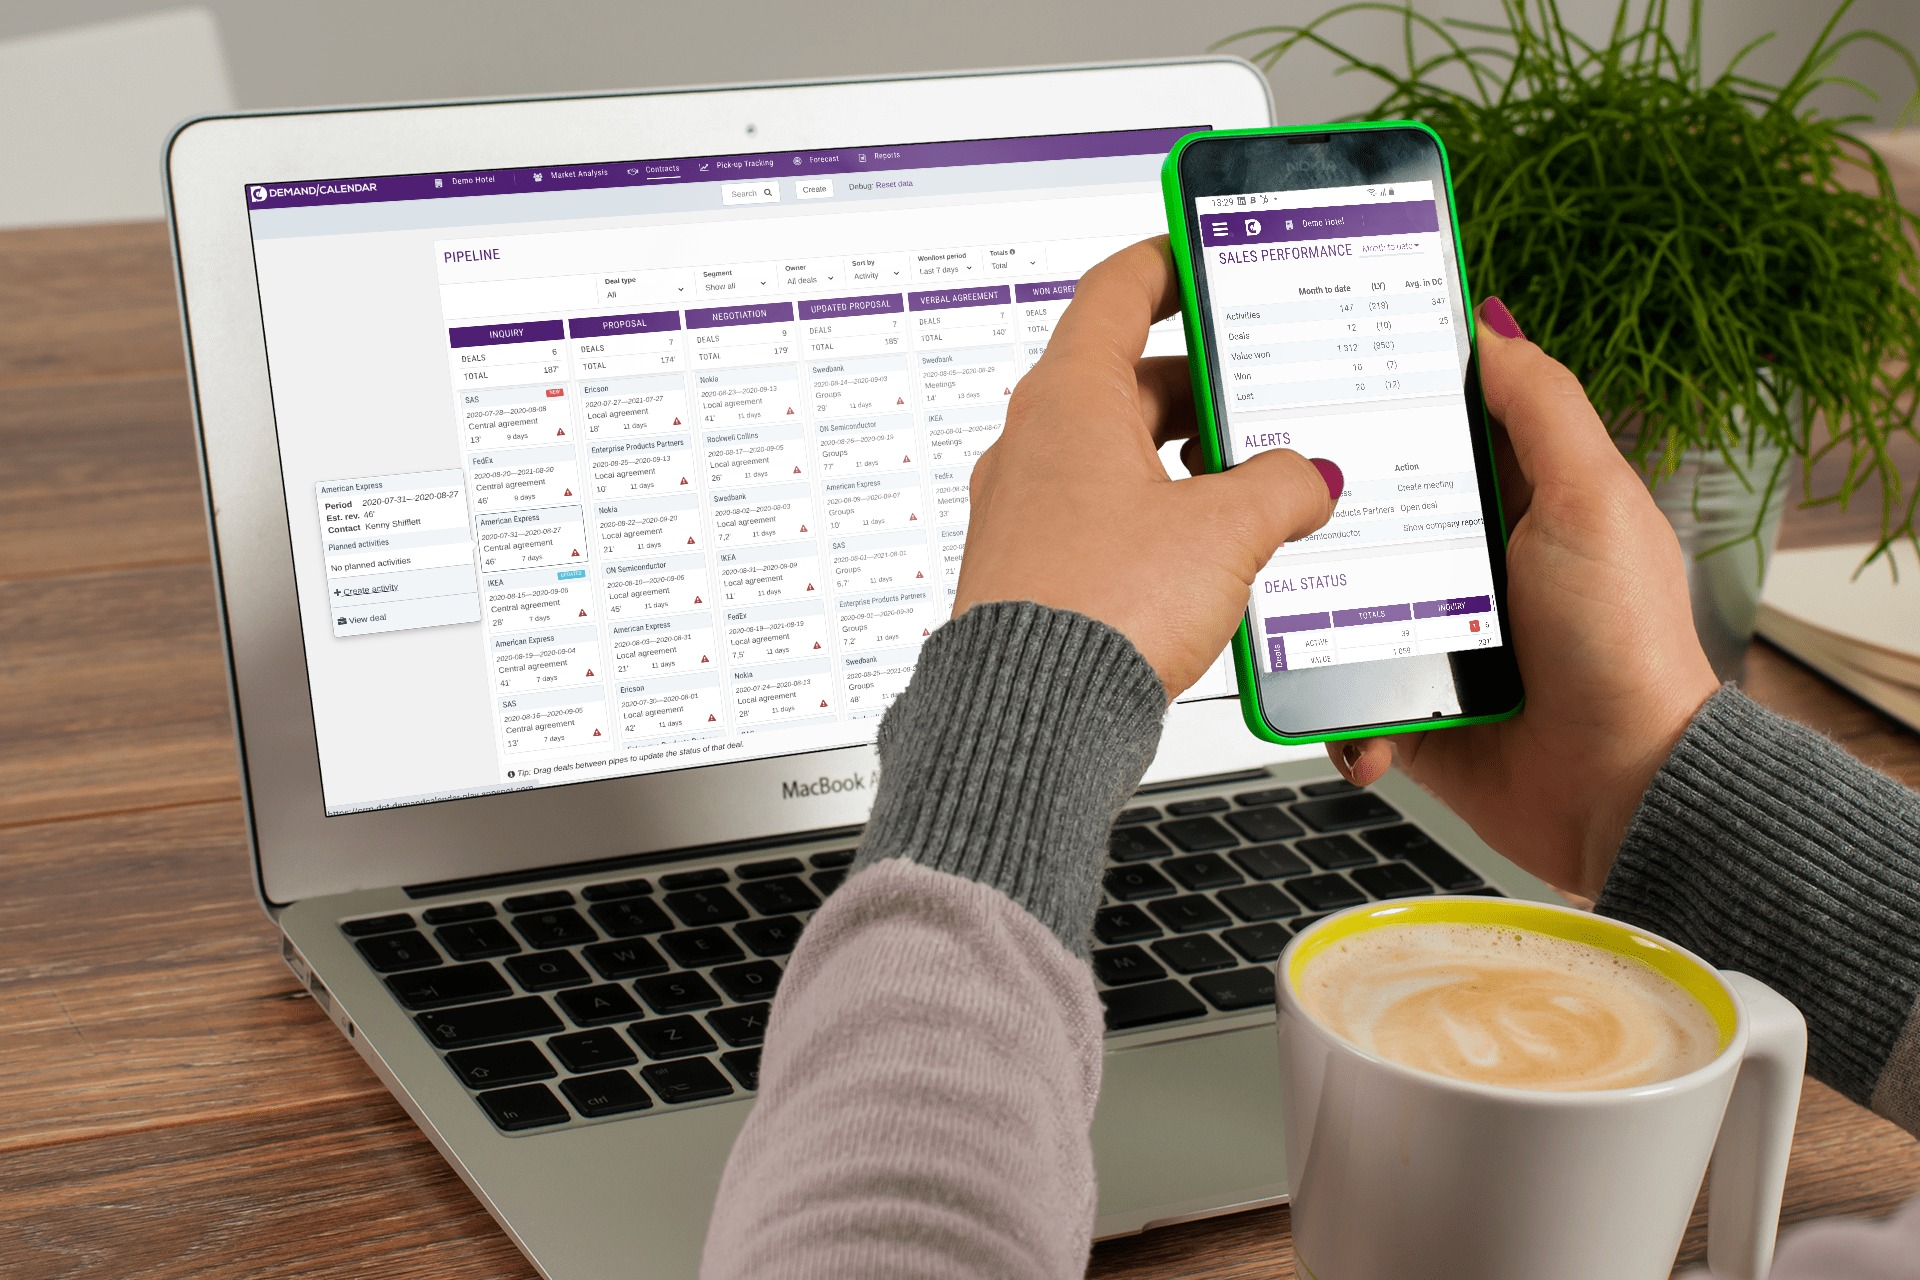 Sales - Pipeline Macbook, daschboard mobile